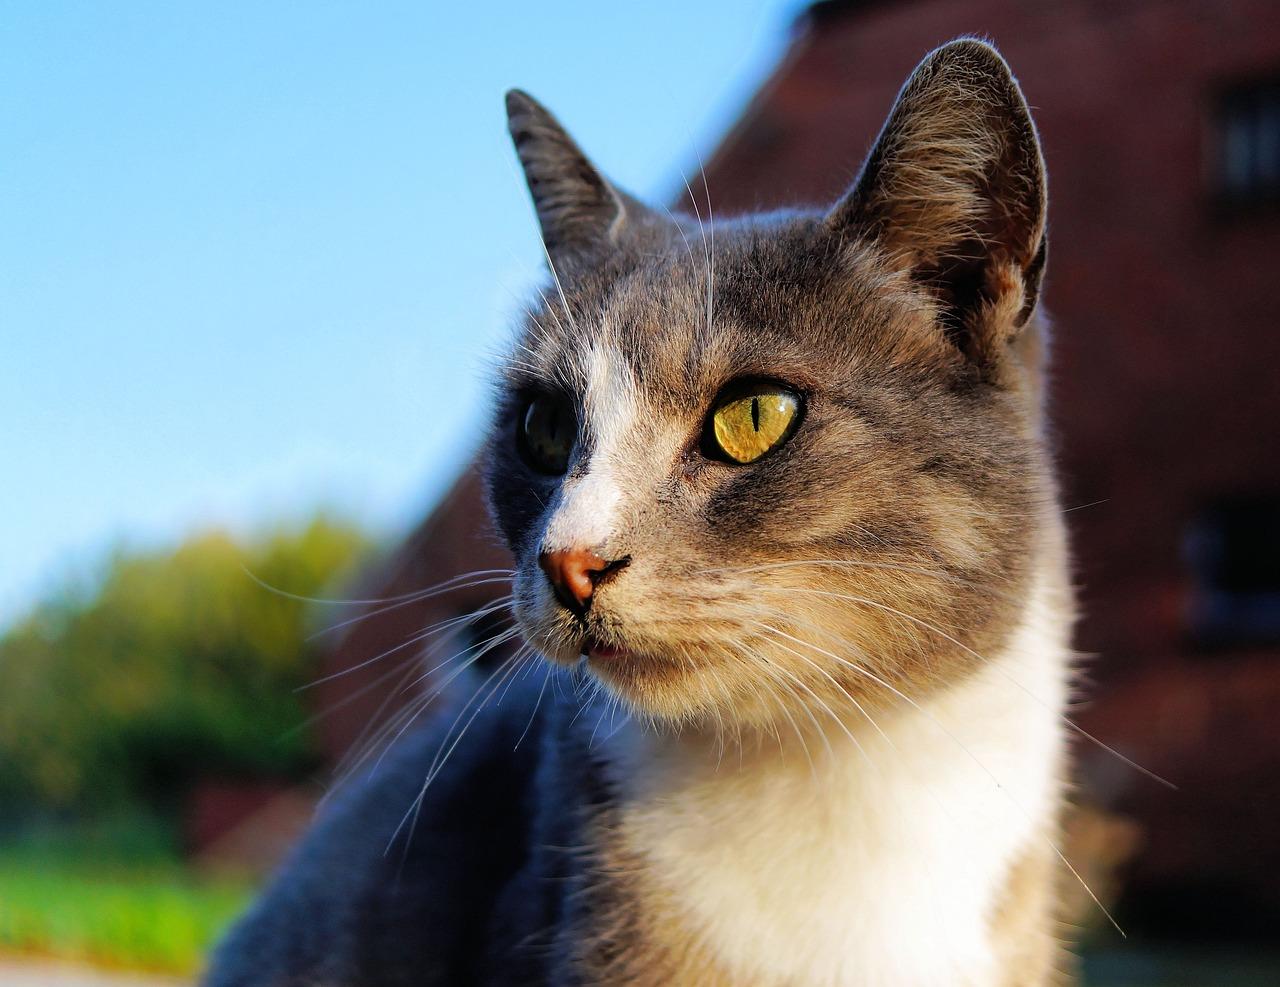 картинки голова кошек царапины можно легко